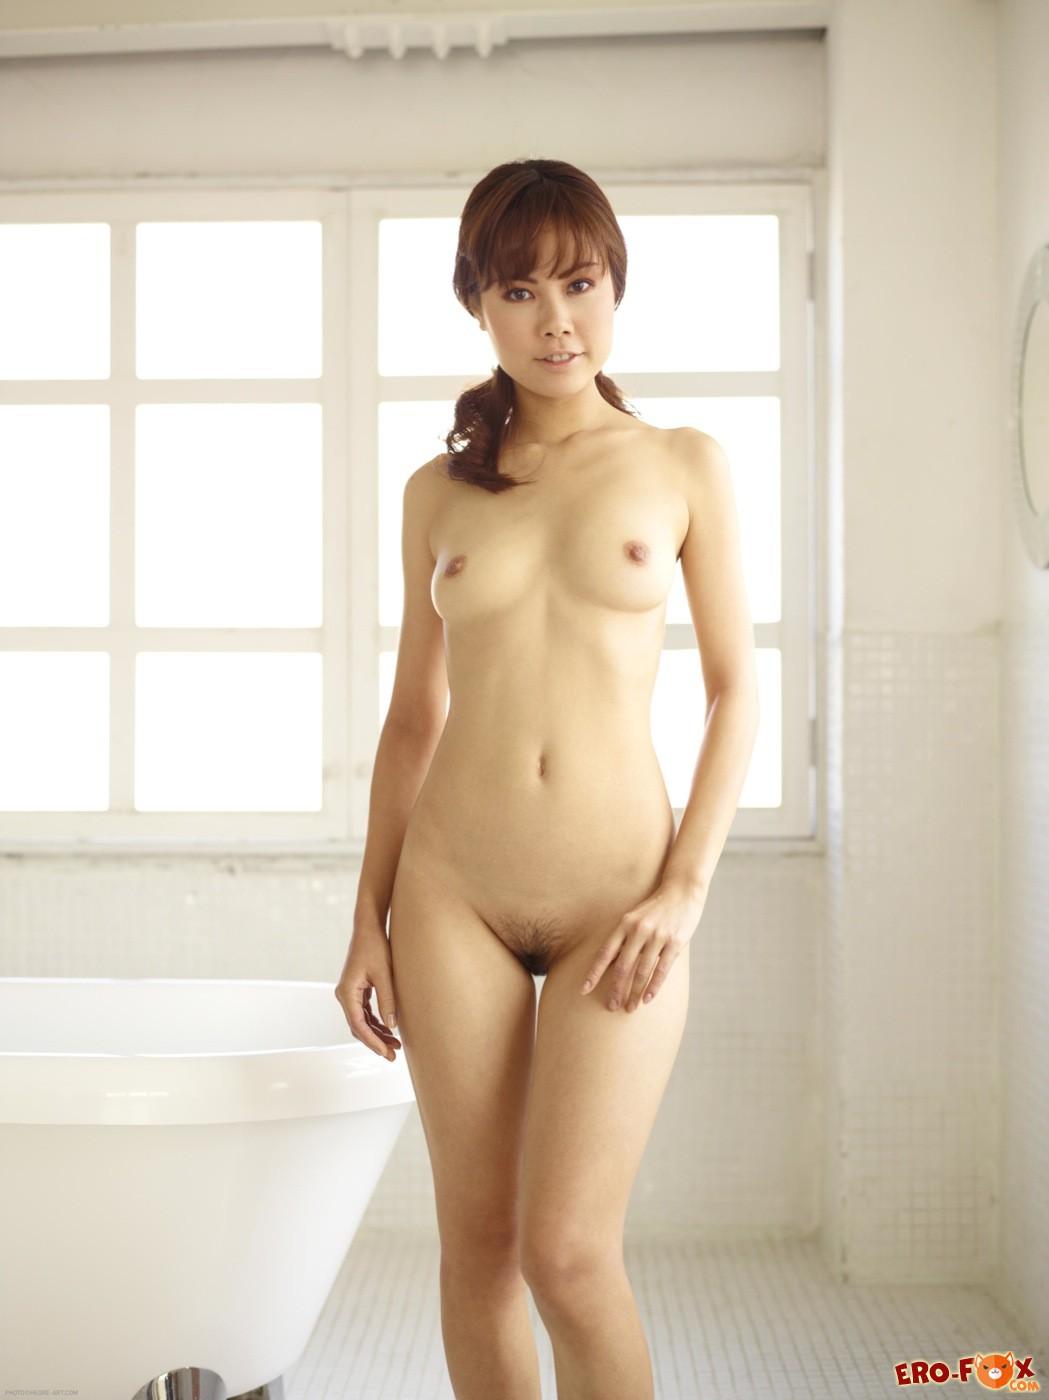 Симпатичная кореянка сняла халатик в ванной комнате - фото